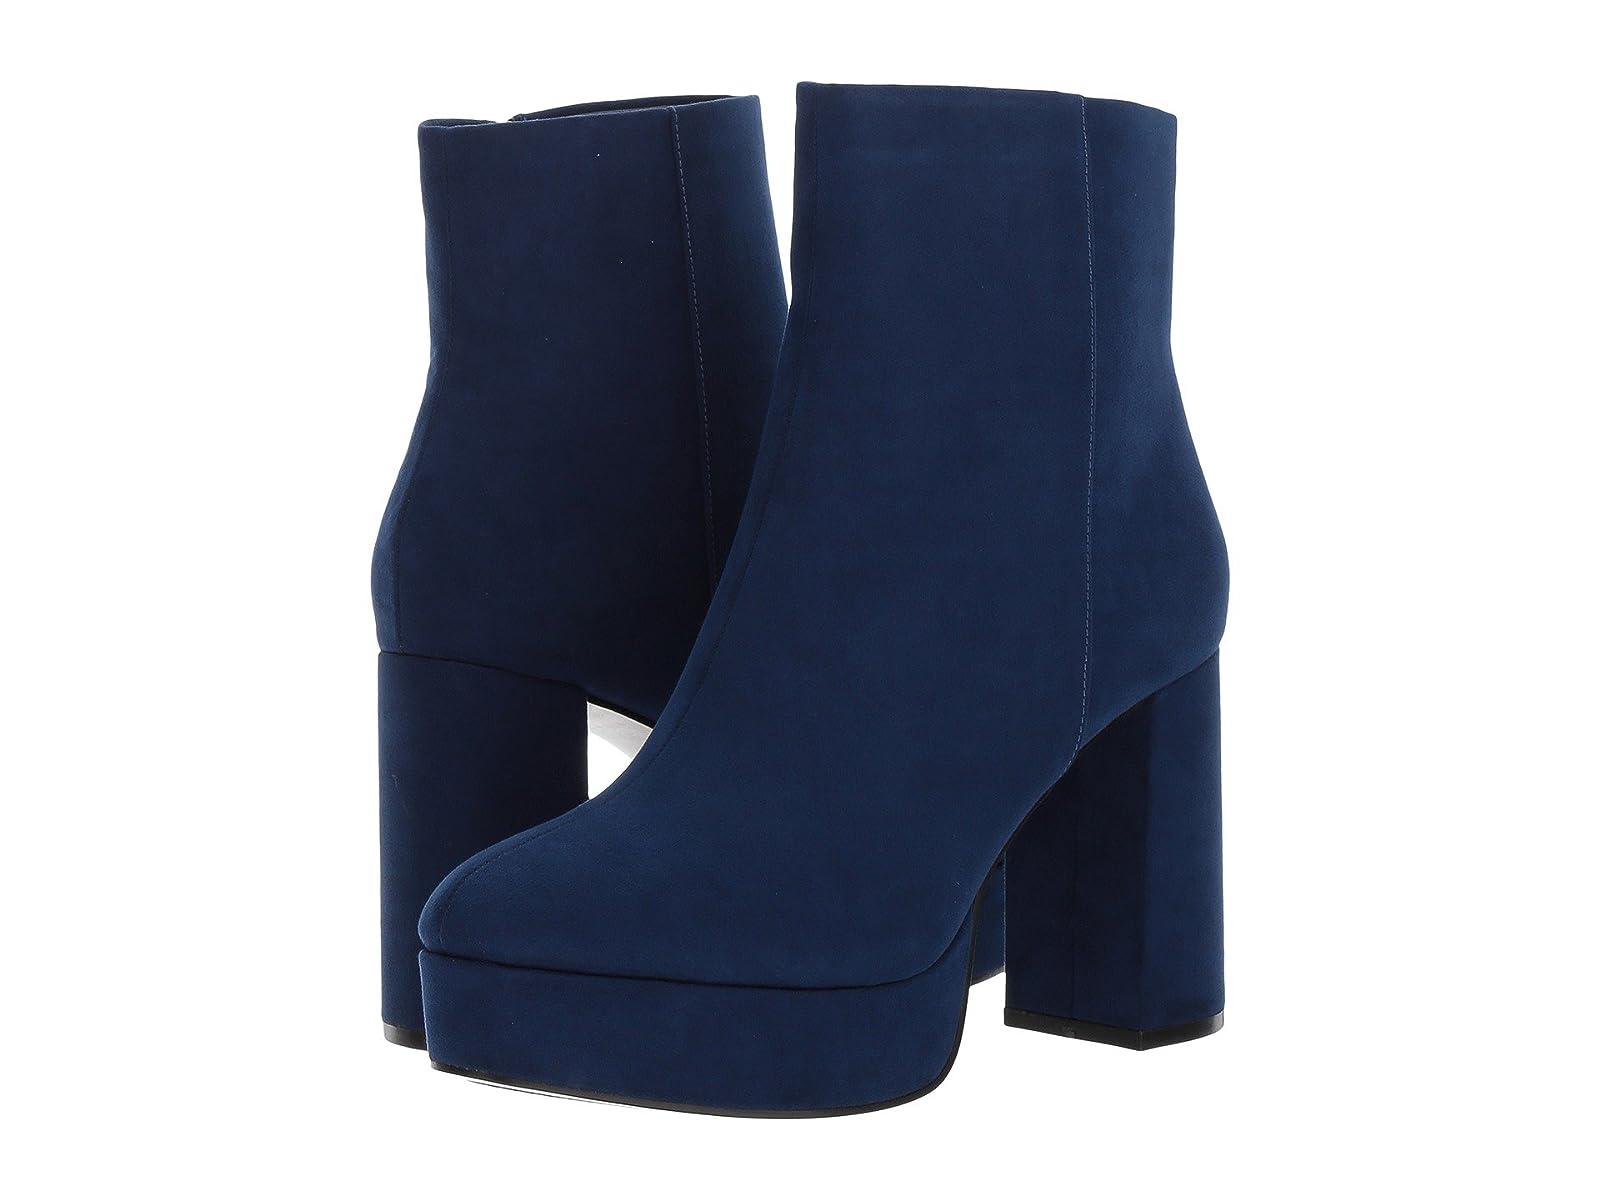 Chinese Laundry Nenna BootCheap and distinctive eye-catching shoes